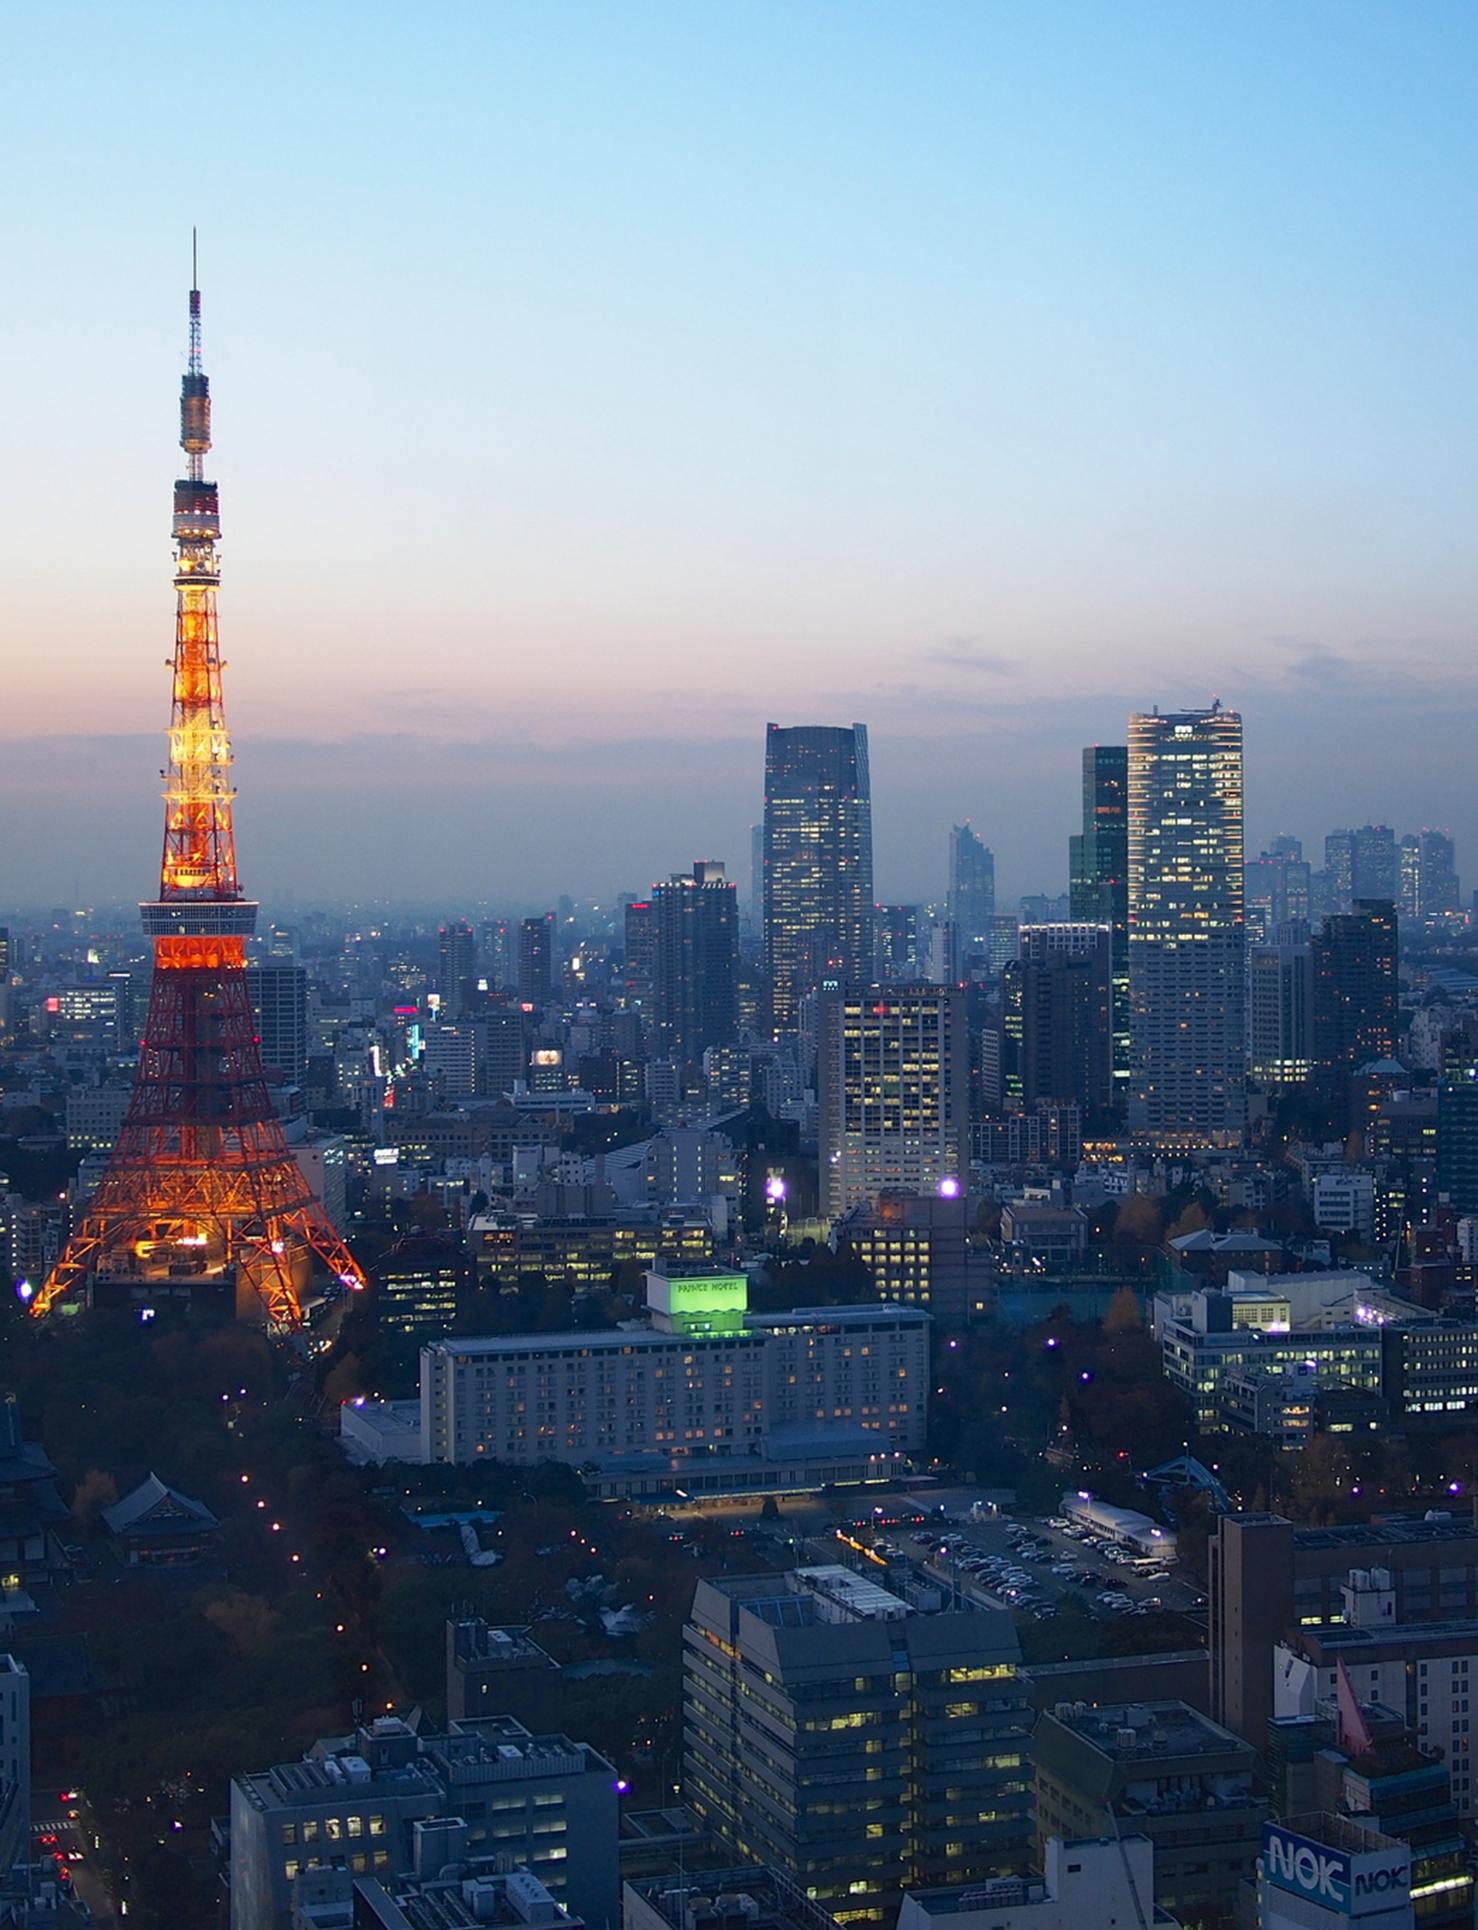 Blue Hour over Tokyo by Balint Foldesl 2